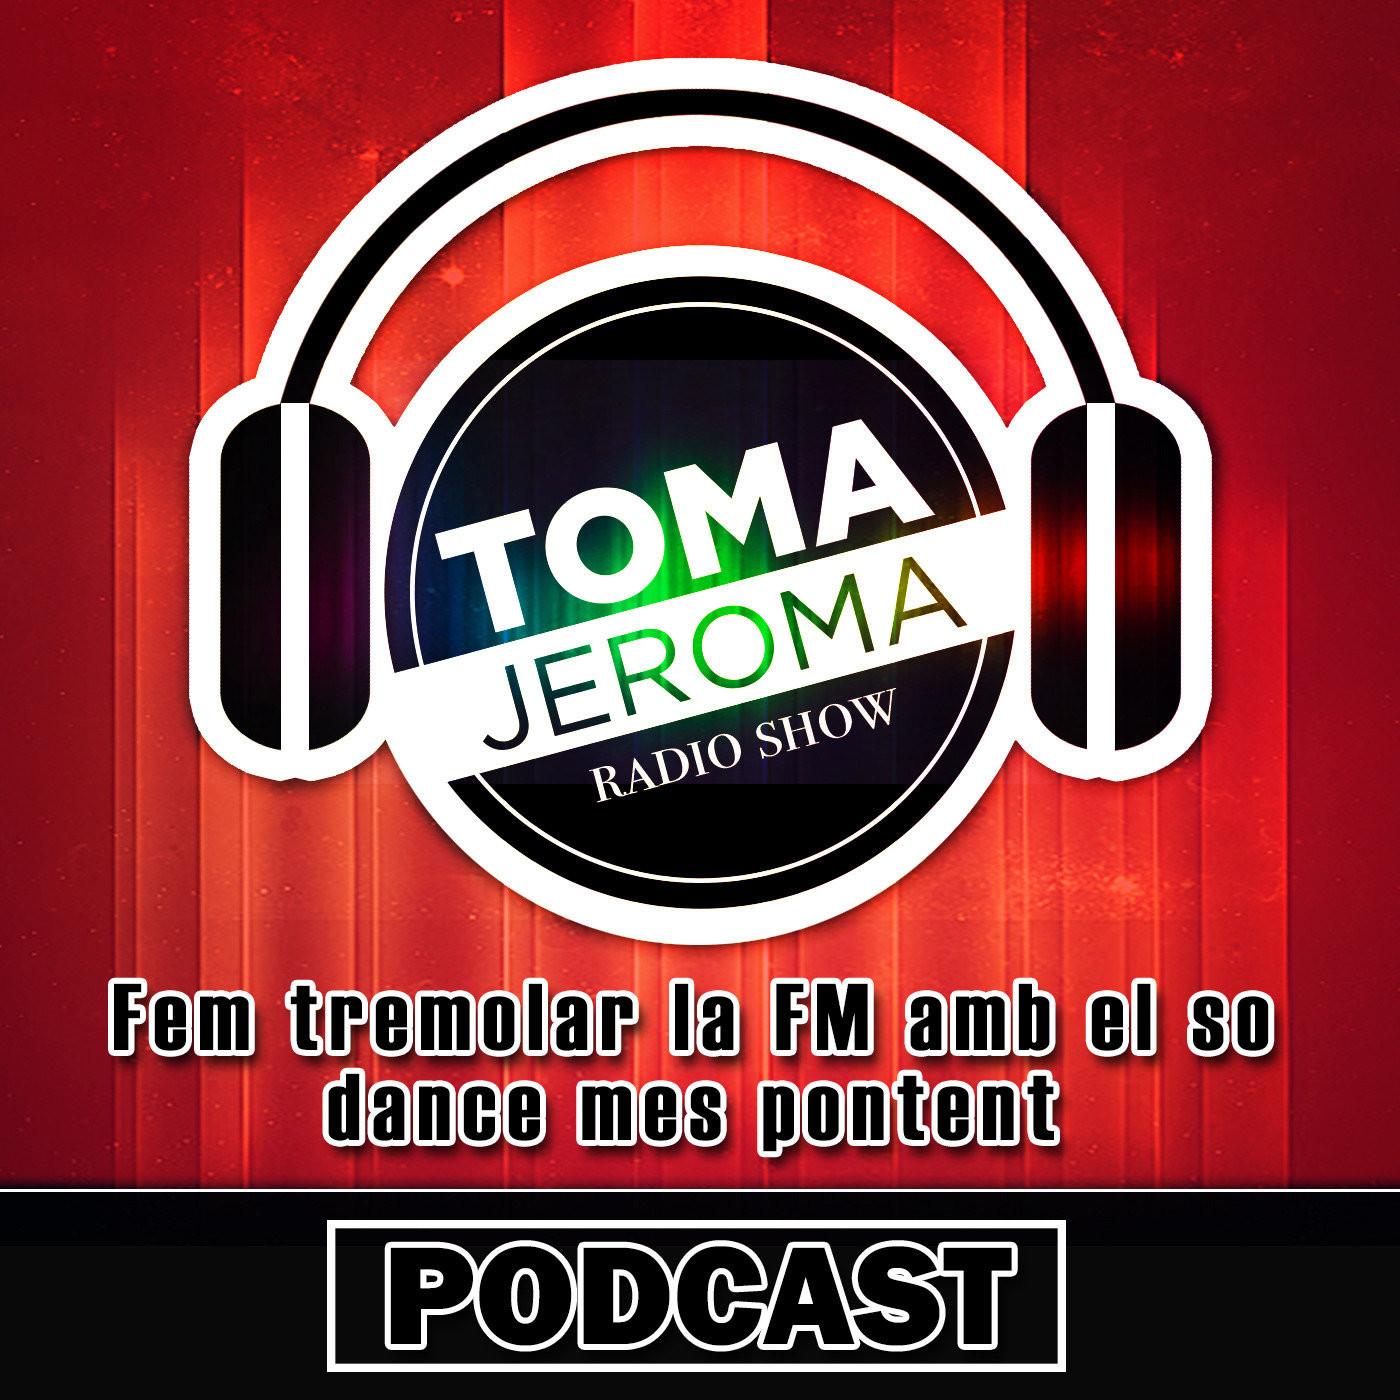 Toma Jeroma Radio Show